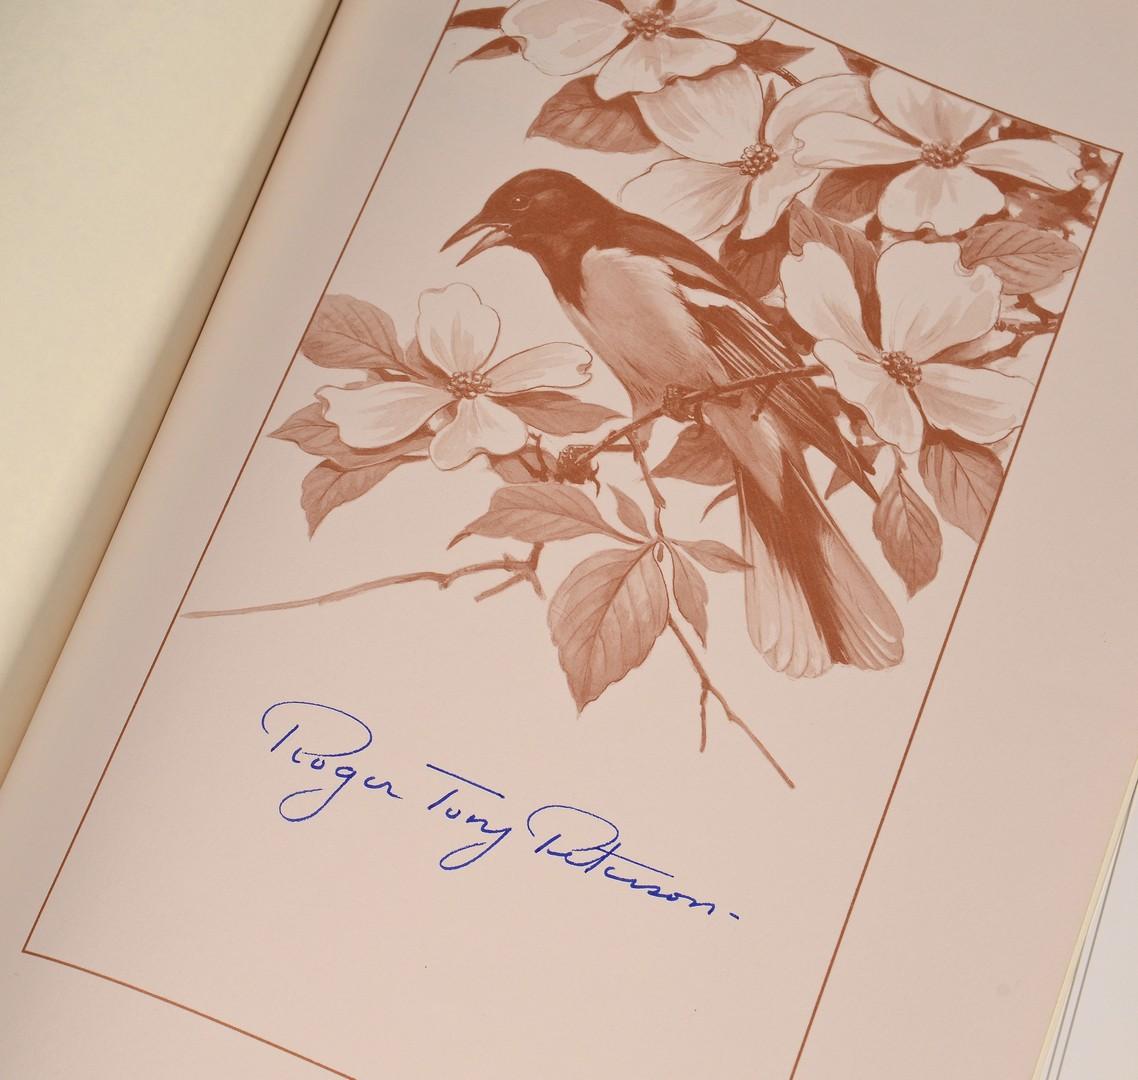 Lot 738: 12 Easton Press Books including The Secret Garden